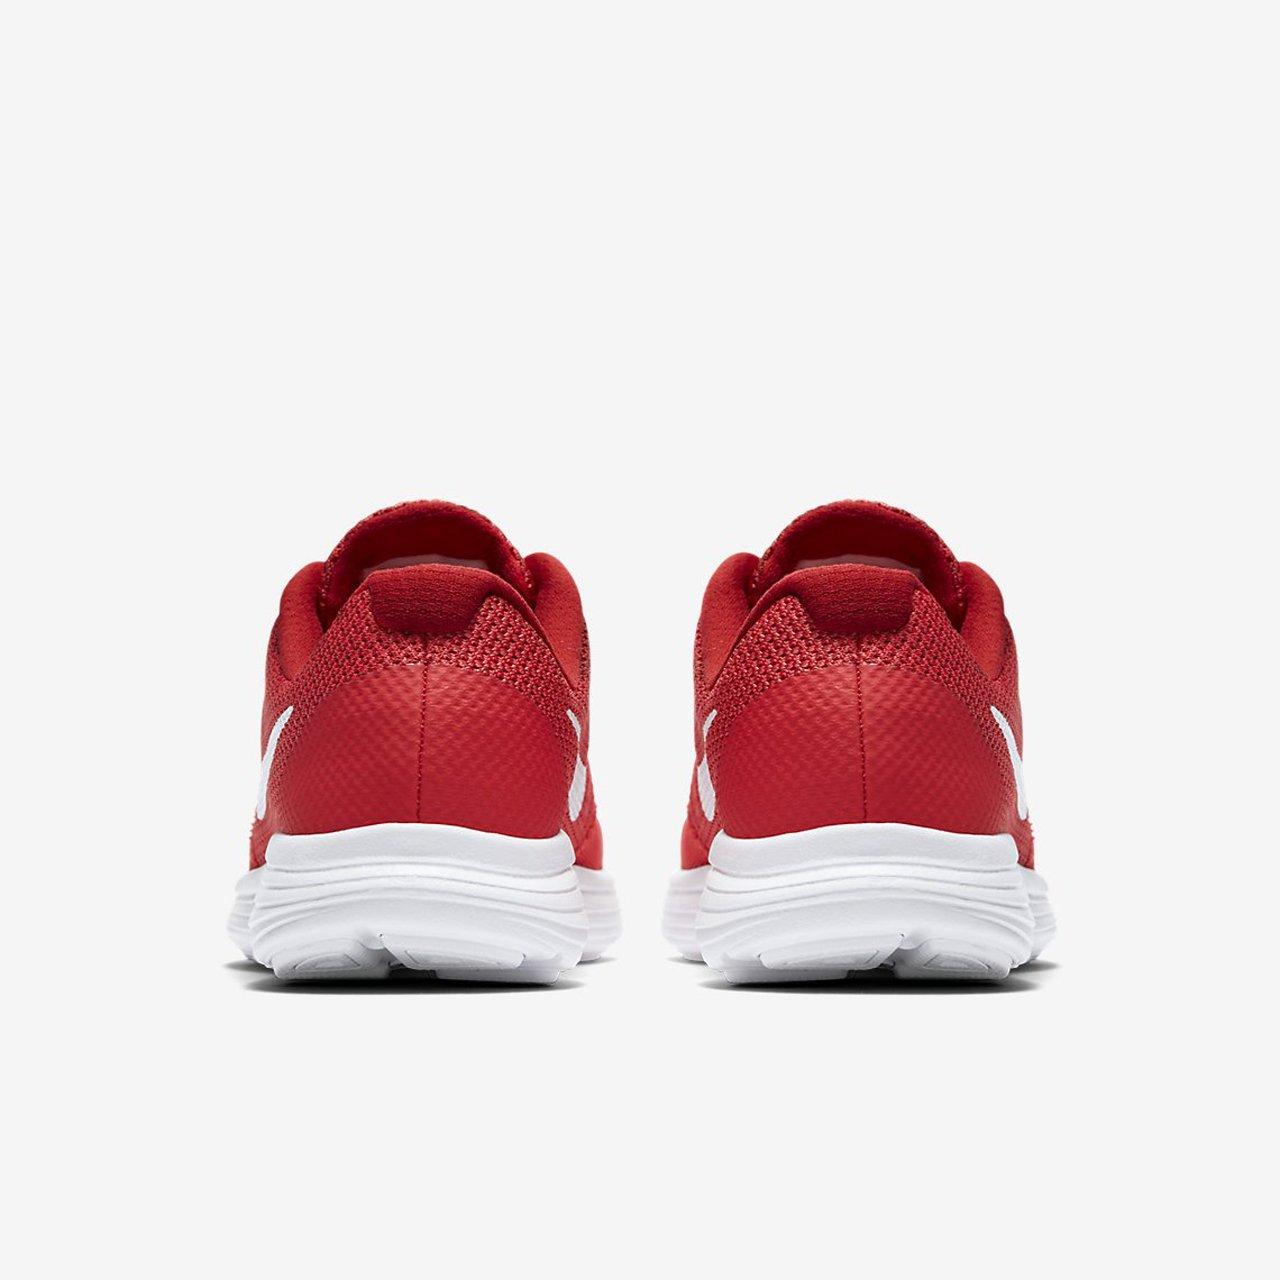 26331037b58 NIKE   Revolution 3 3 3 (GS) Running Shoes B007KQ5QI8 5.5 M US Big .